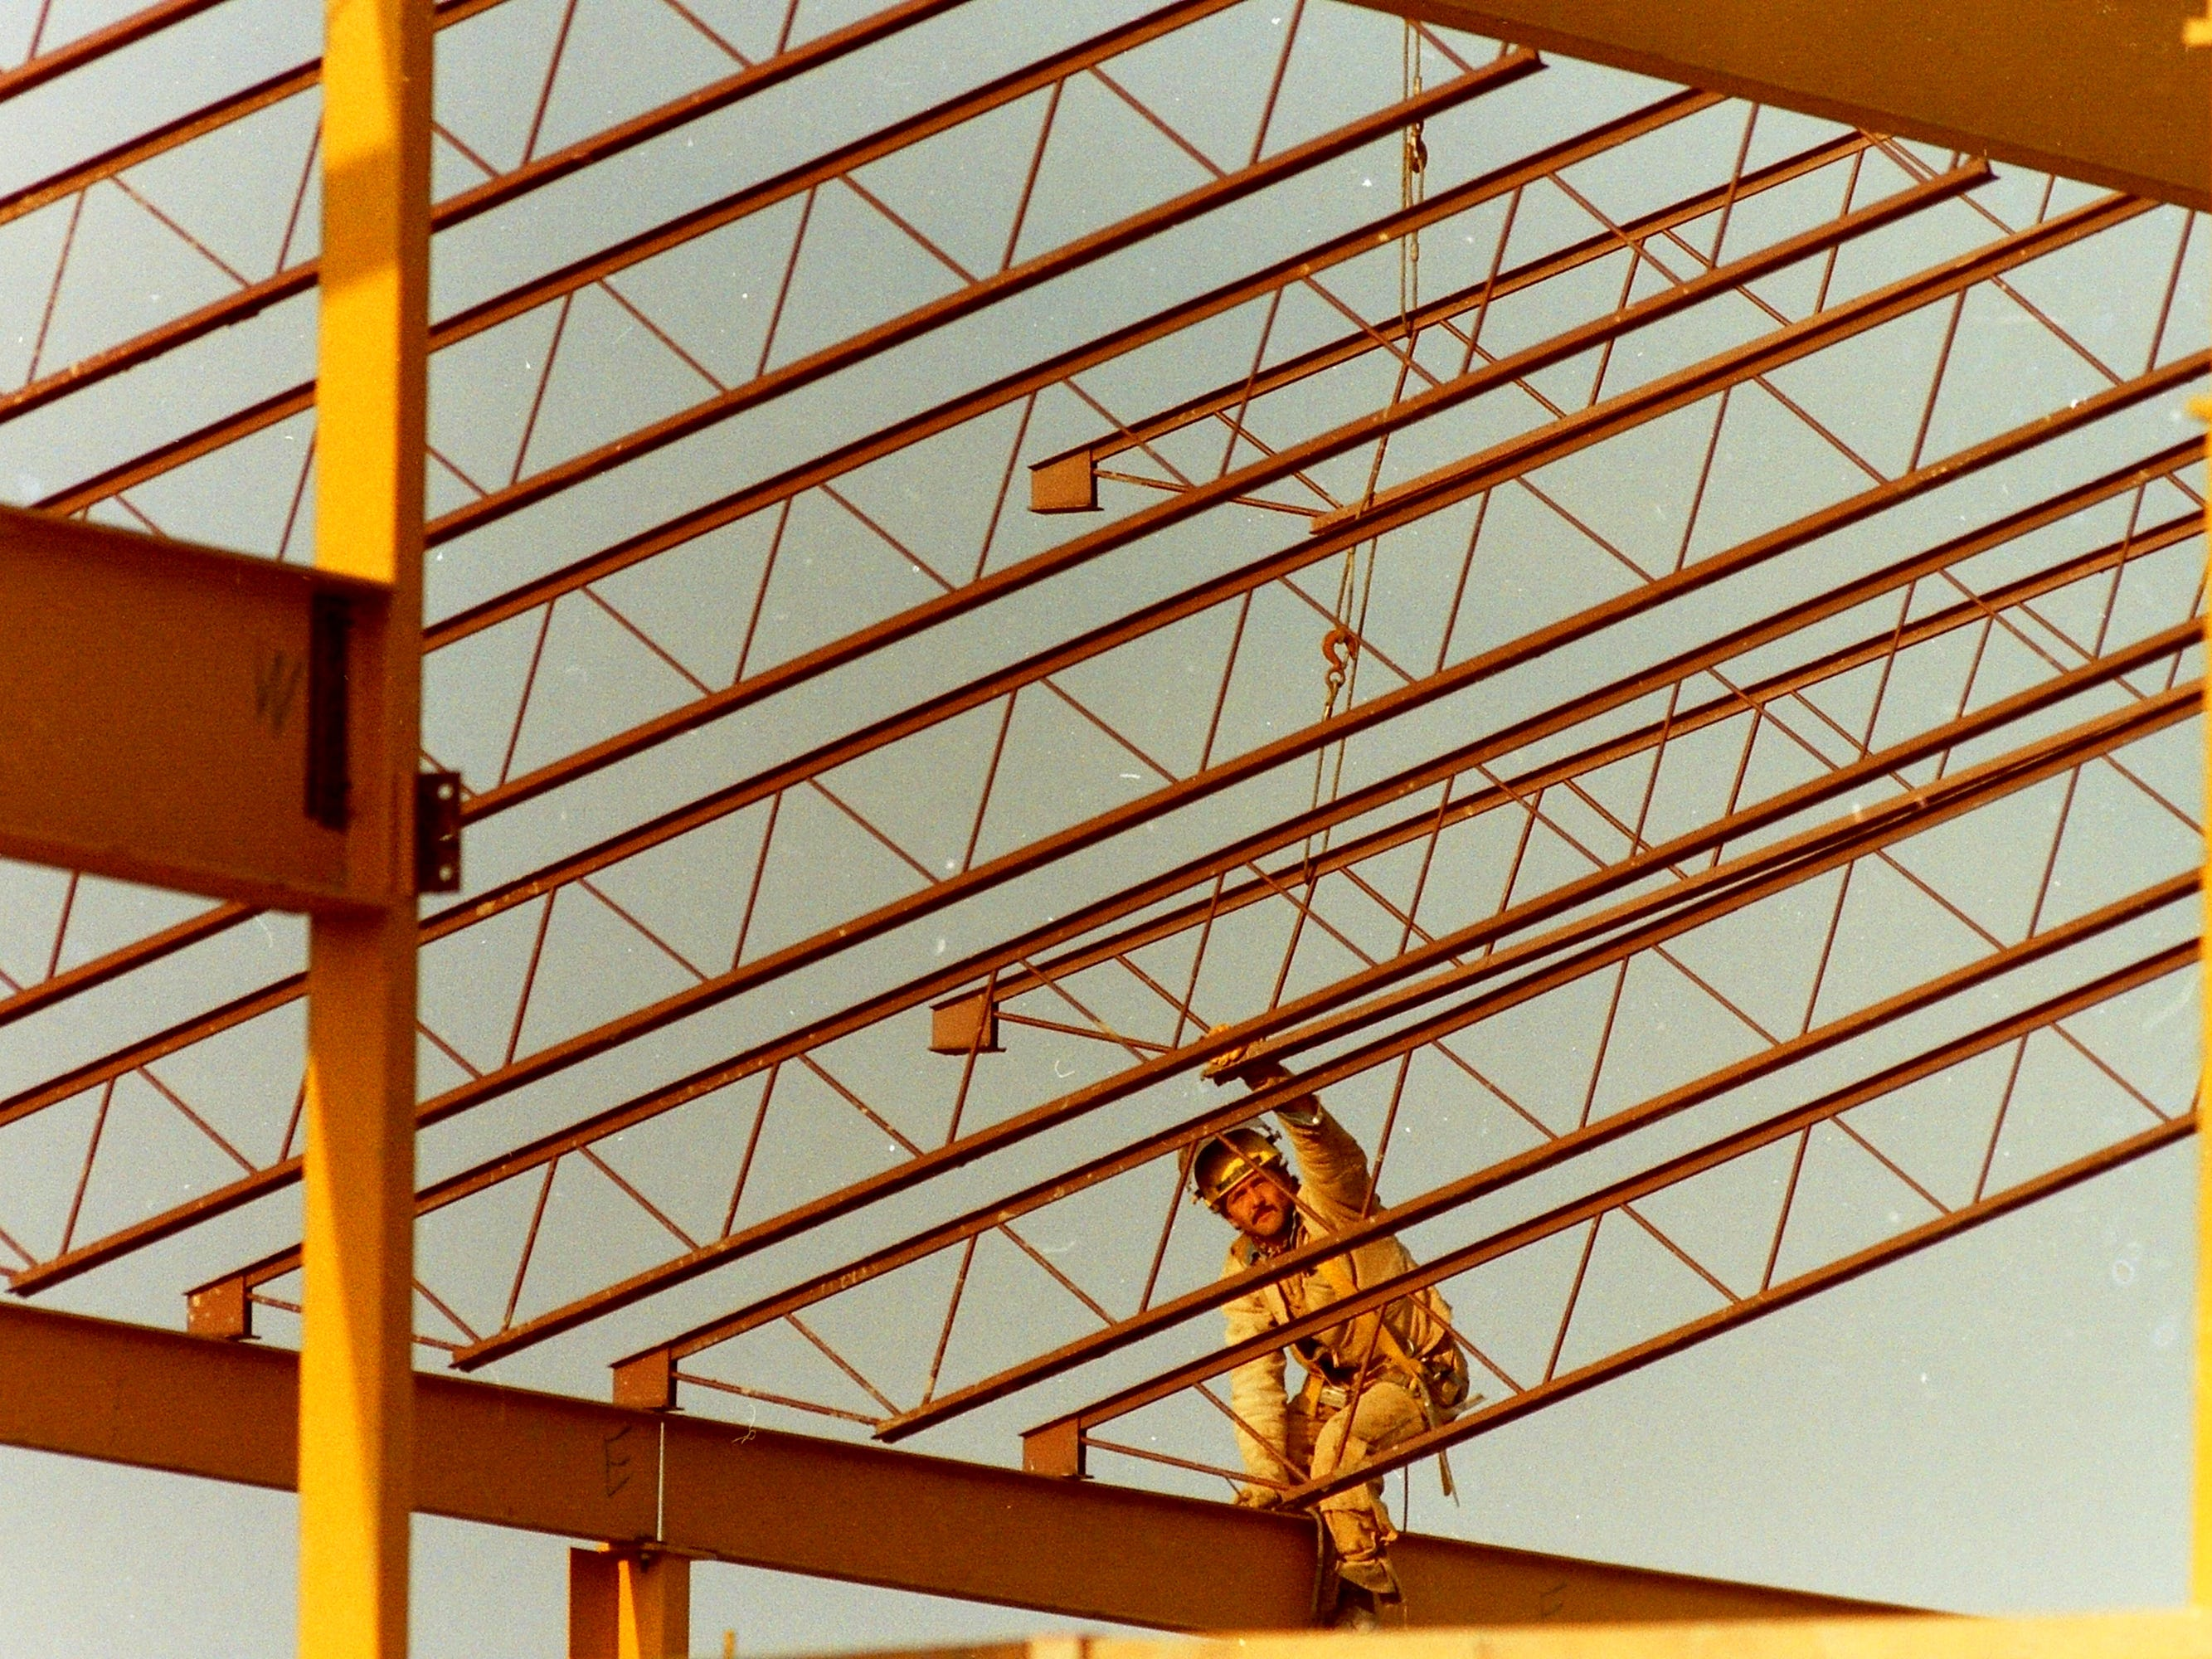 11/05/92Junior High Construction